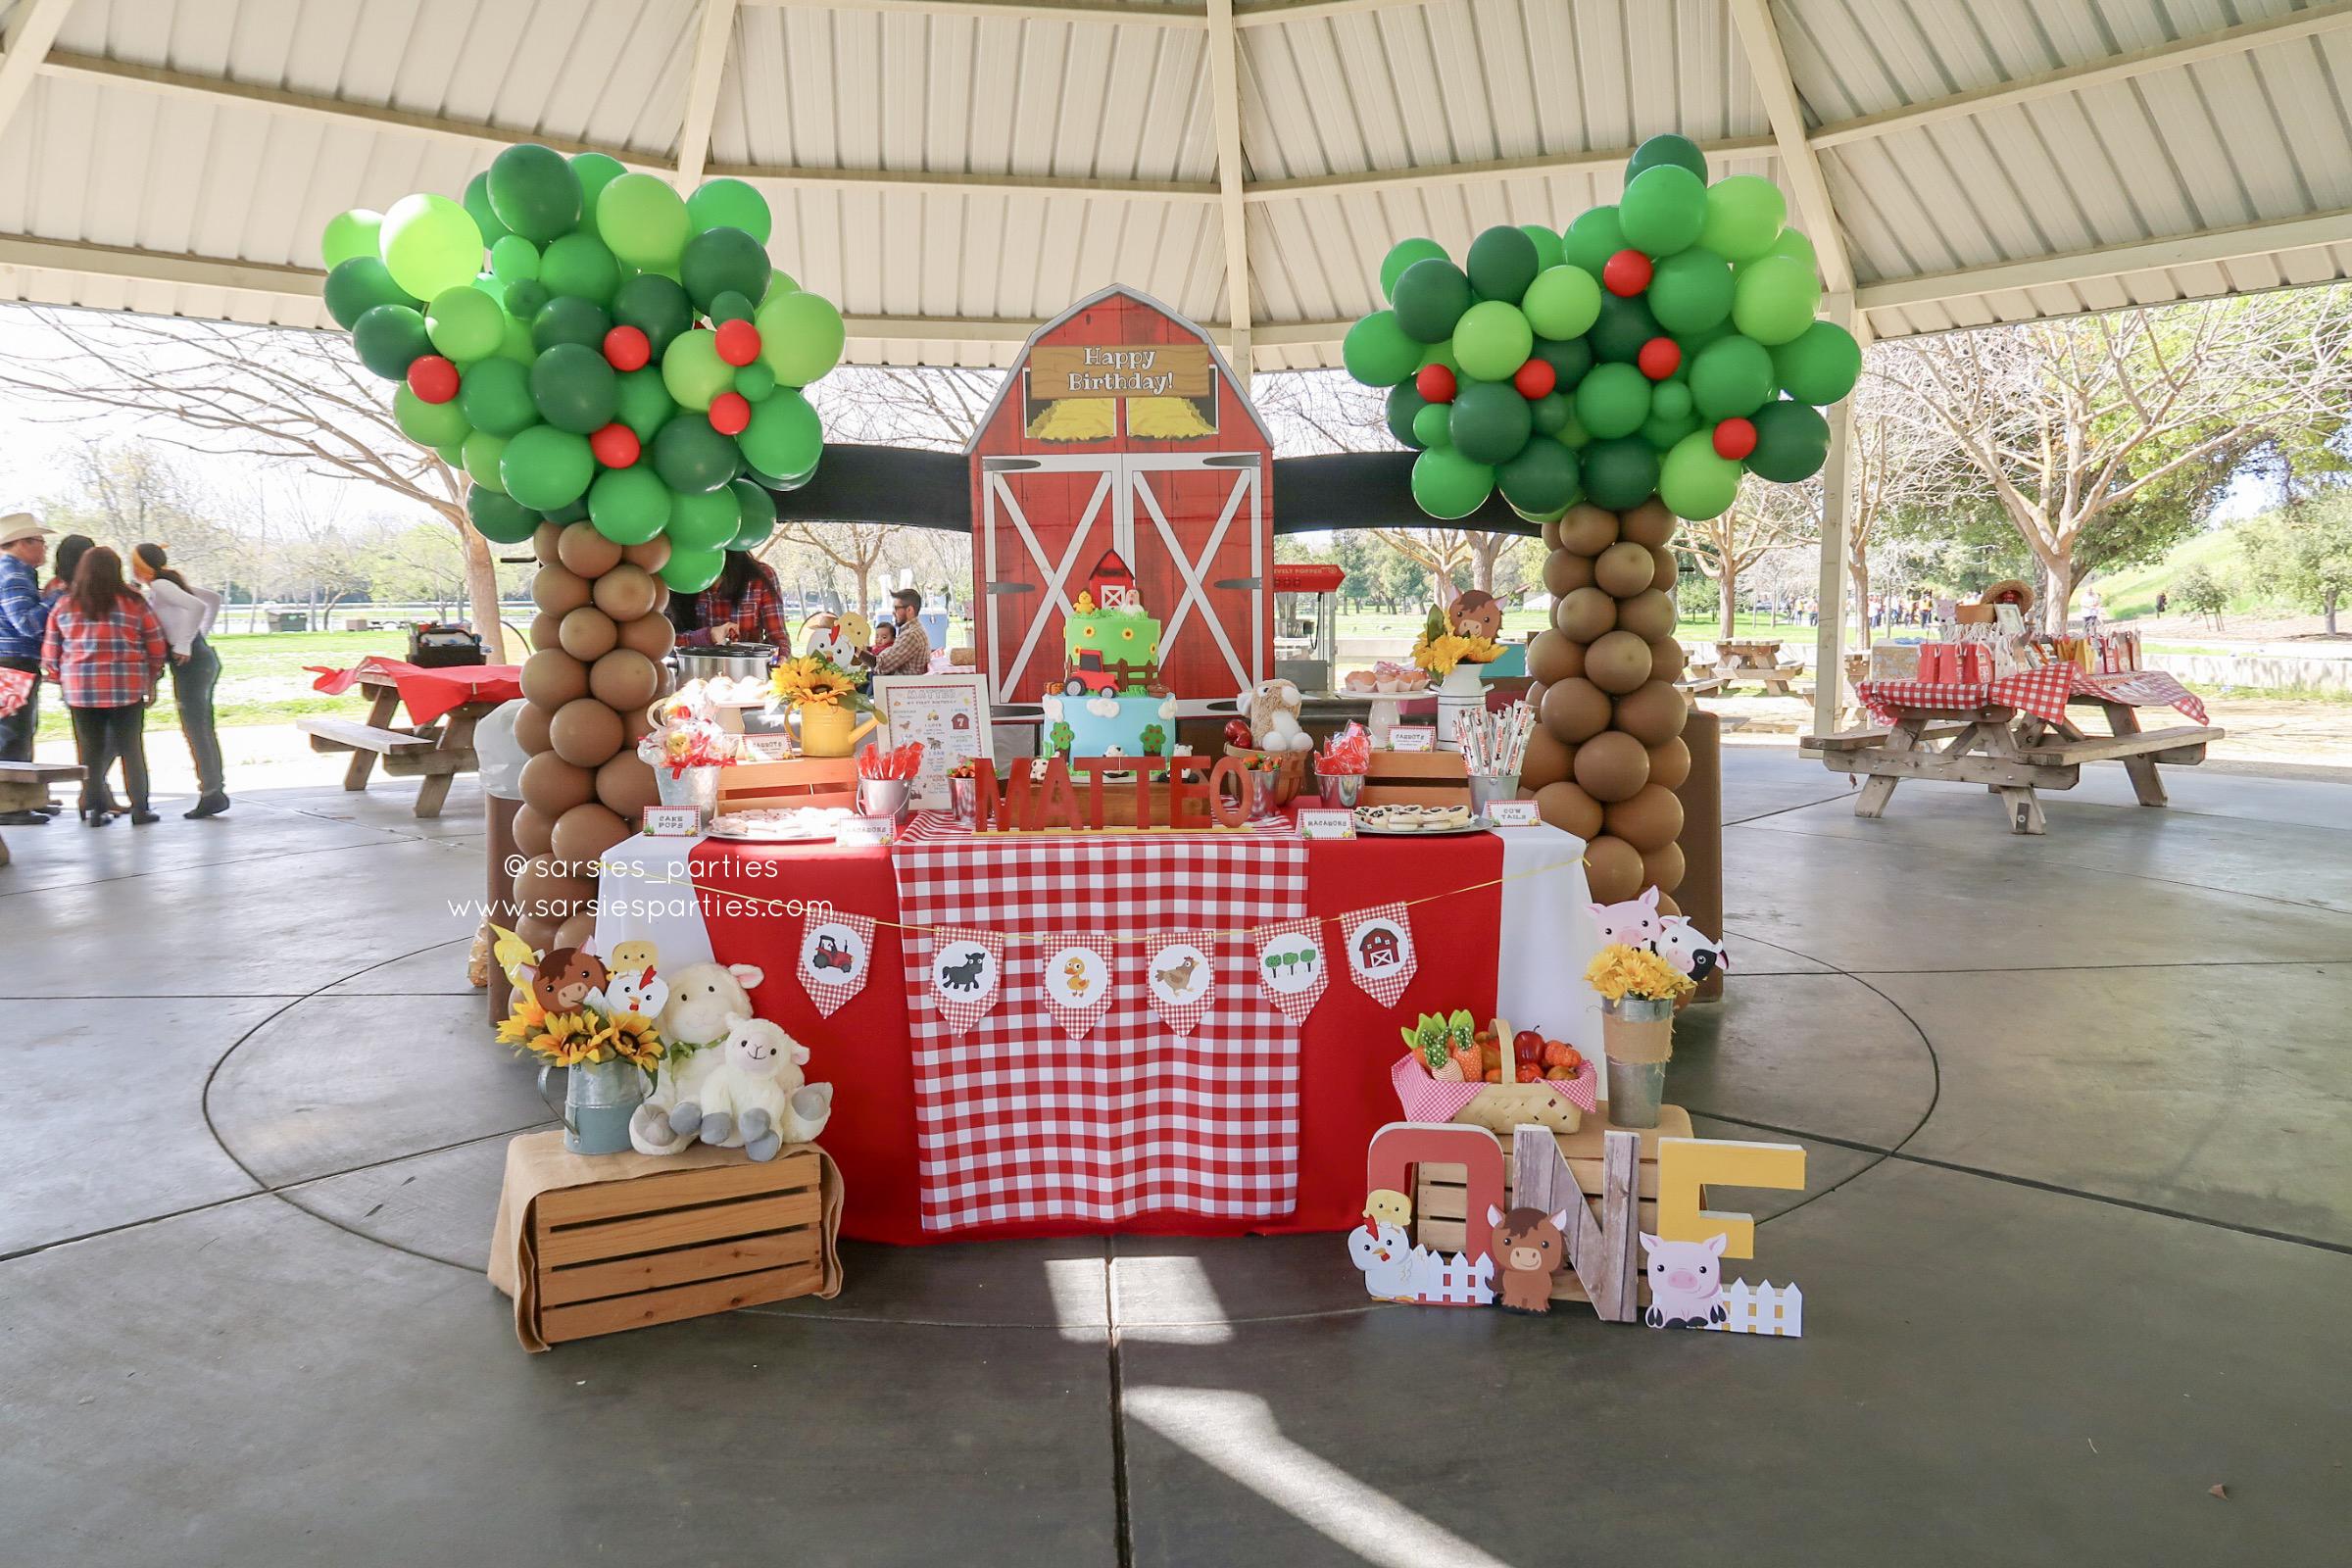 Sarsie's Parties 03-23-19 Barnyard 1st Birthday Party